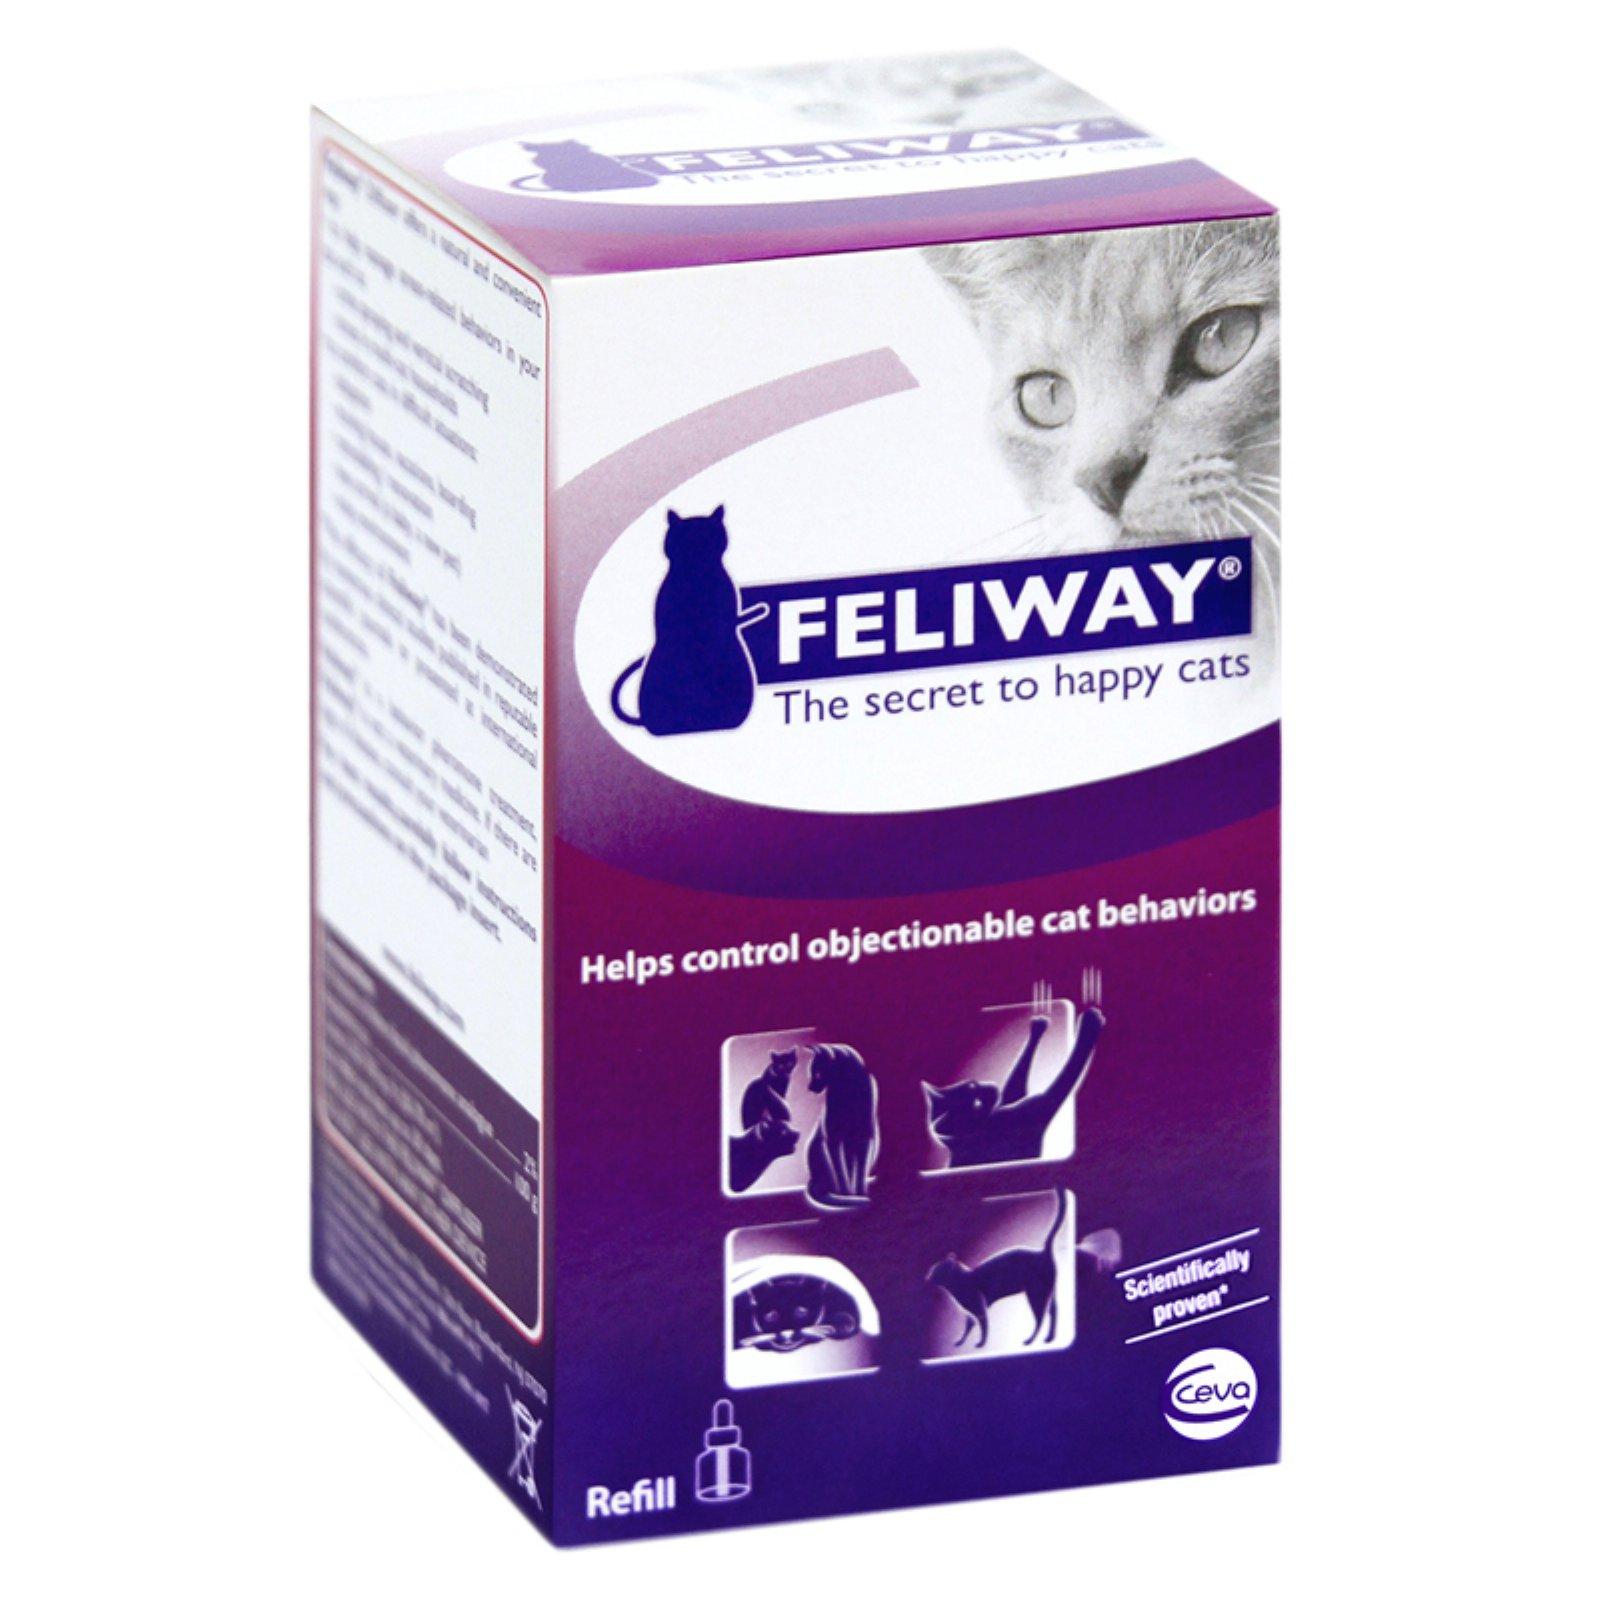 Feliway/Comfort Zone Behavior Modifier Refill 48 ml. - Single Vial